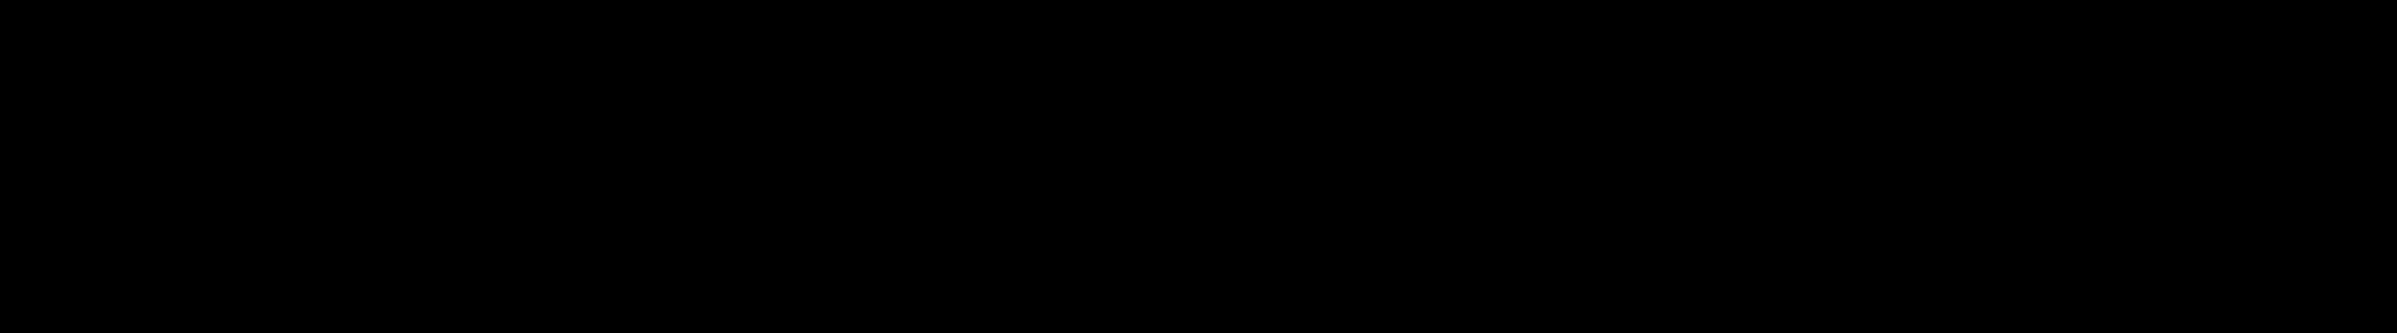 etude5_rechauffementmusique